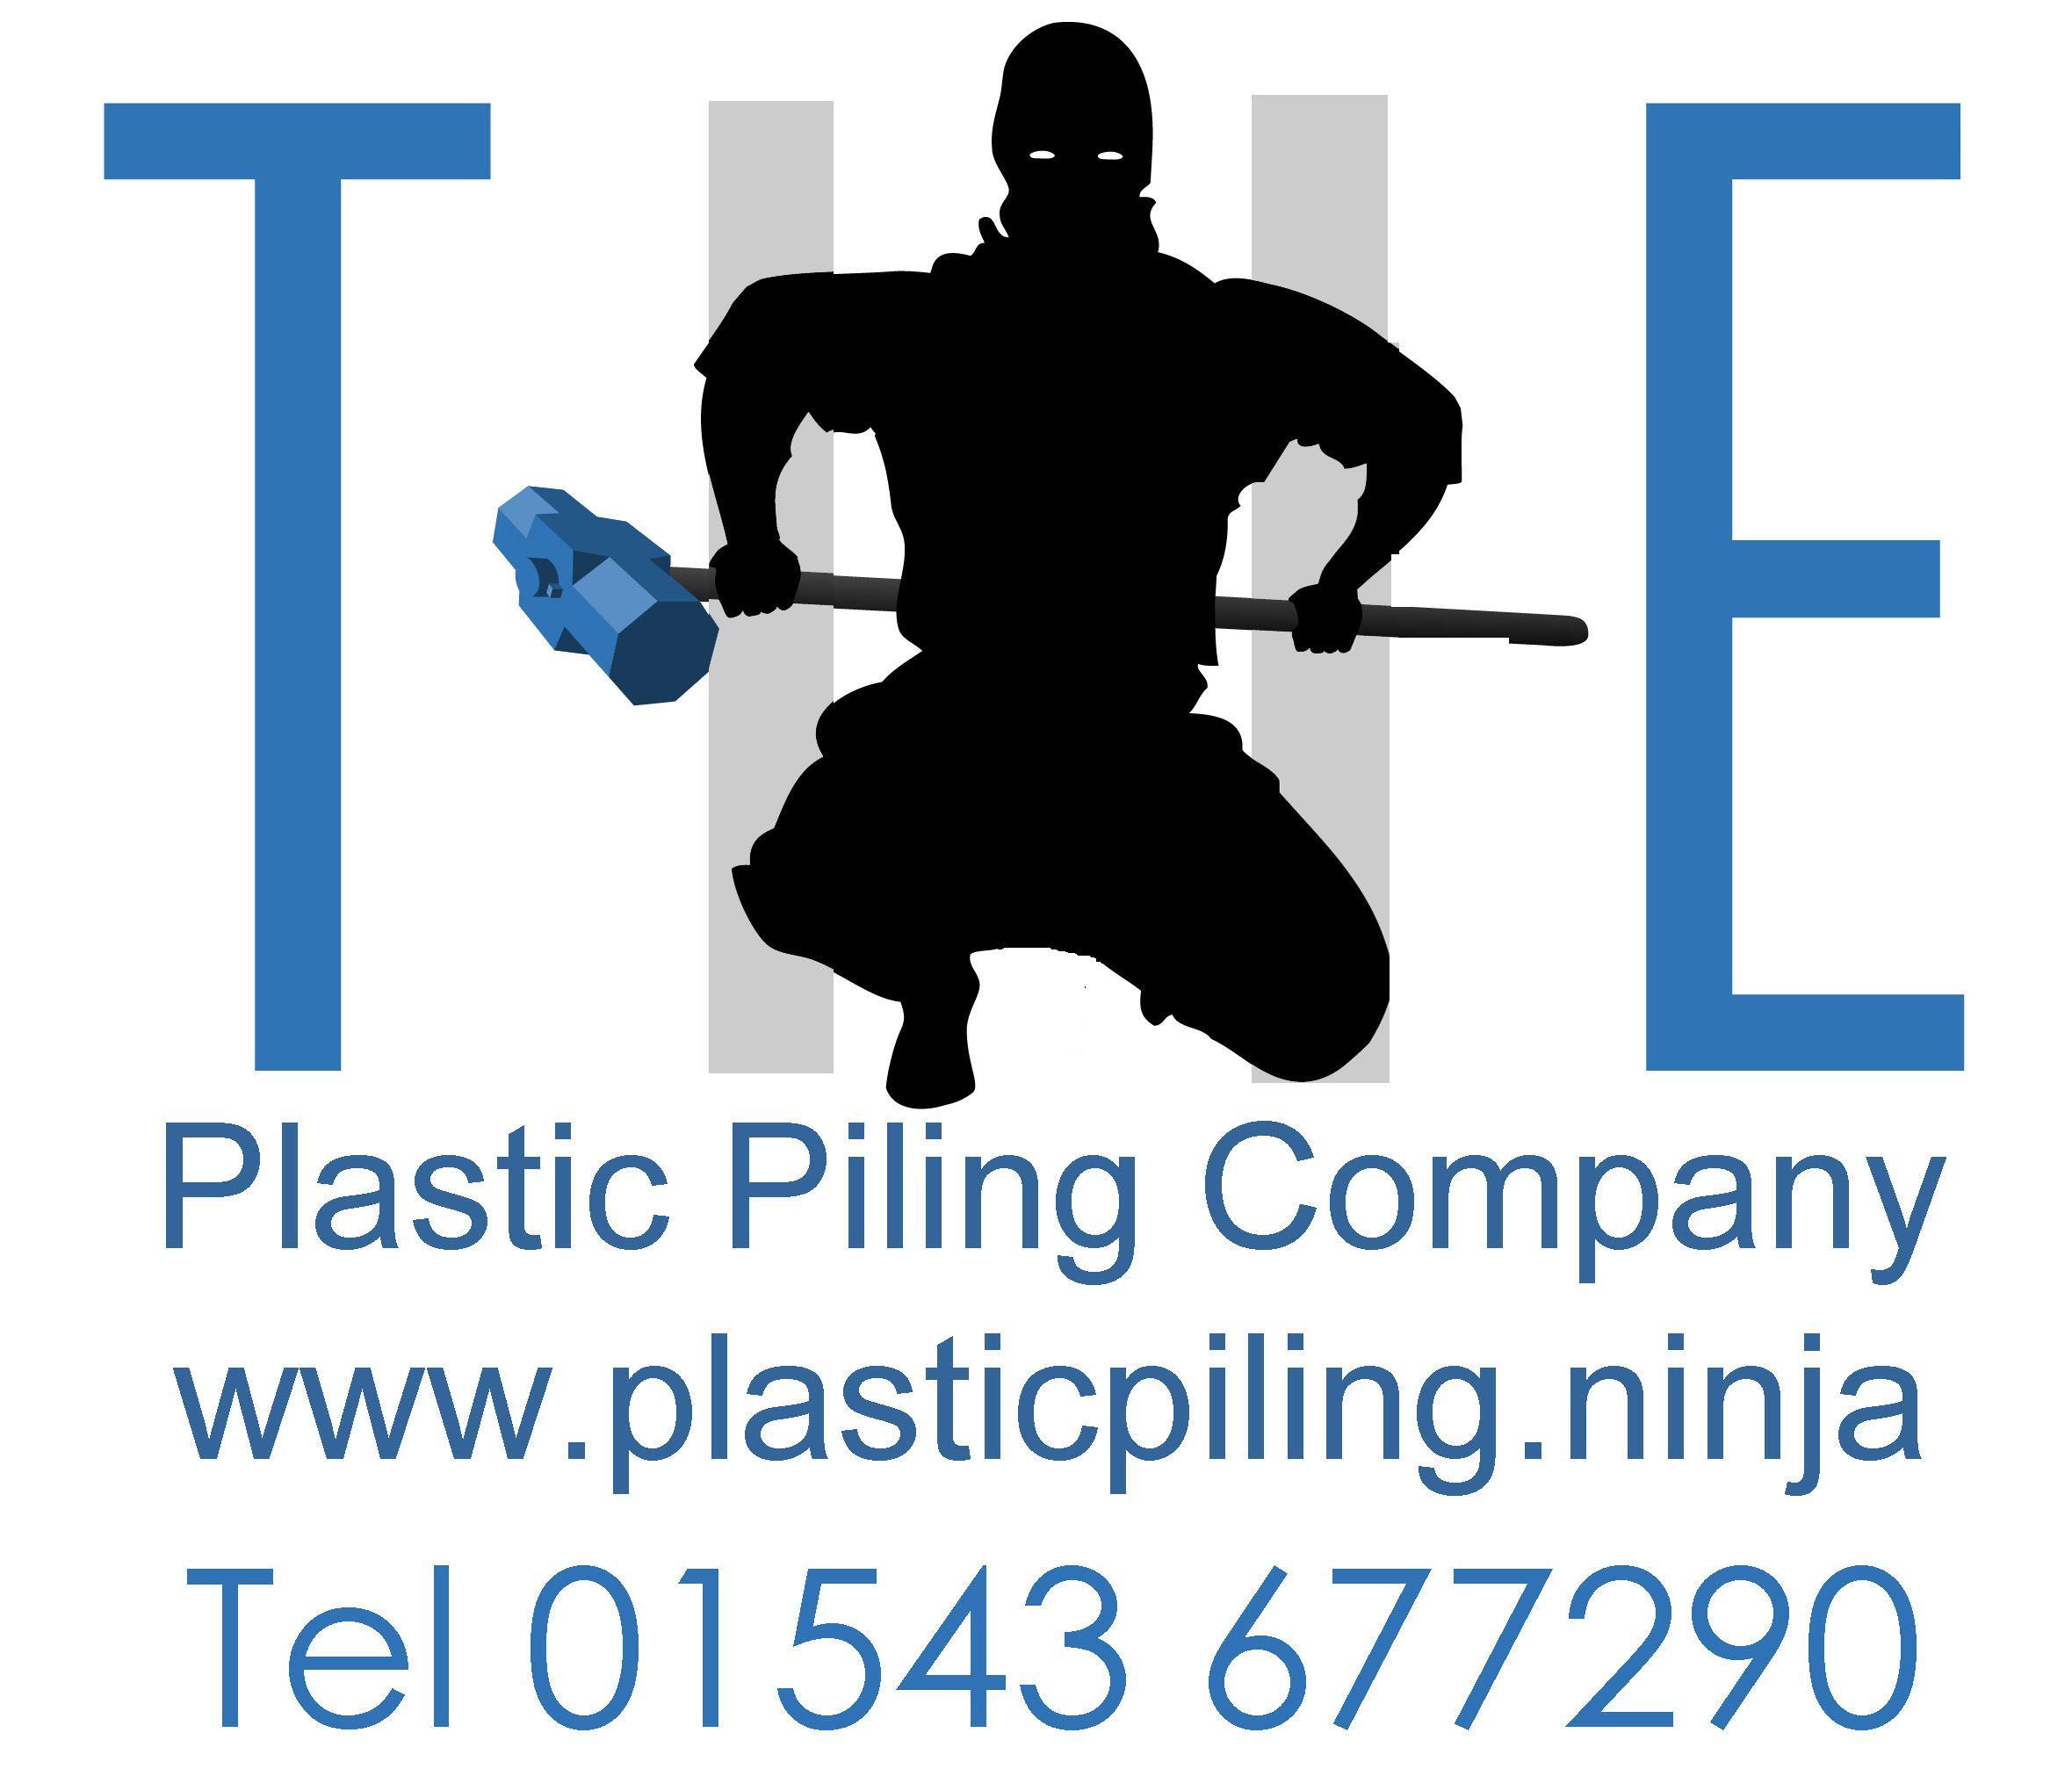 T.H.E. Plastic Piling Company